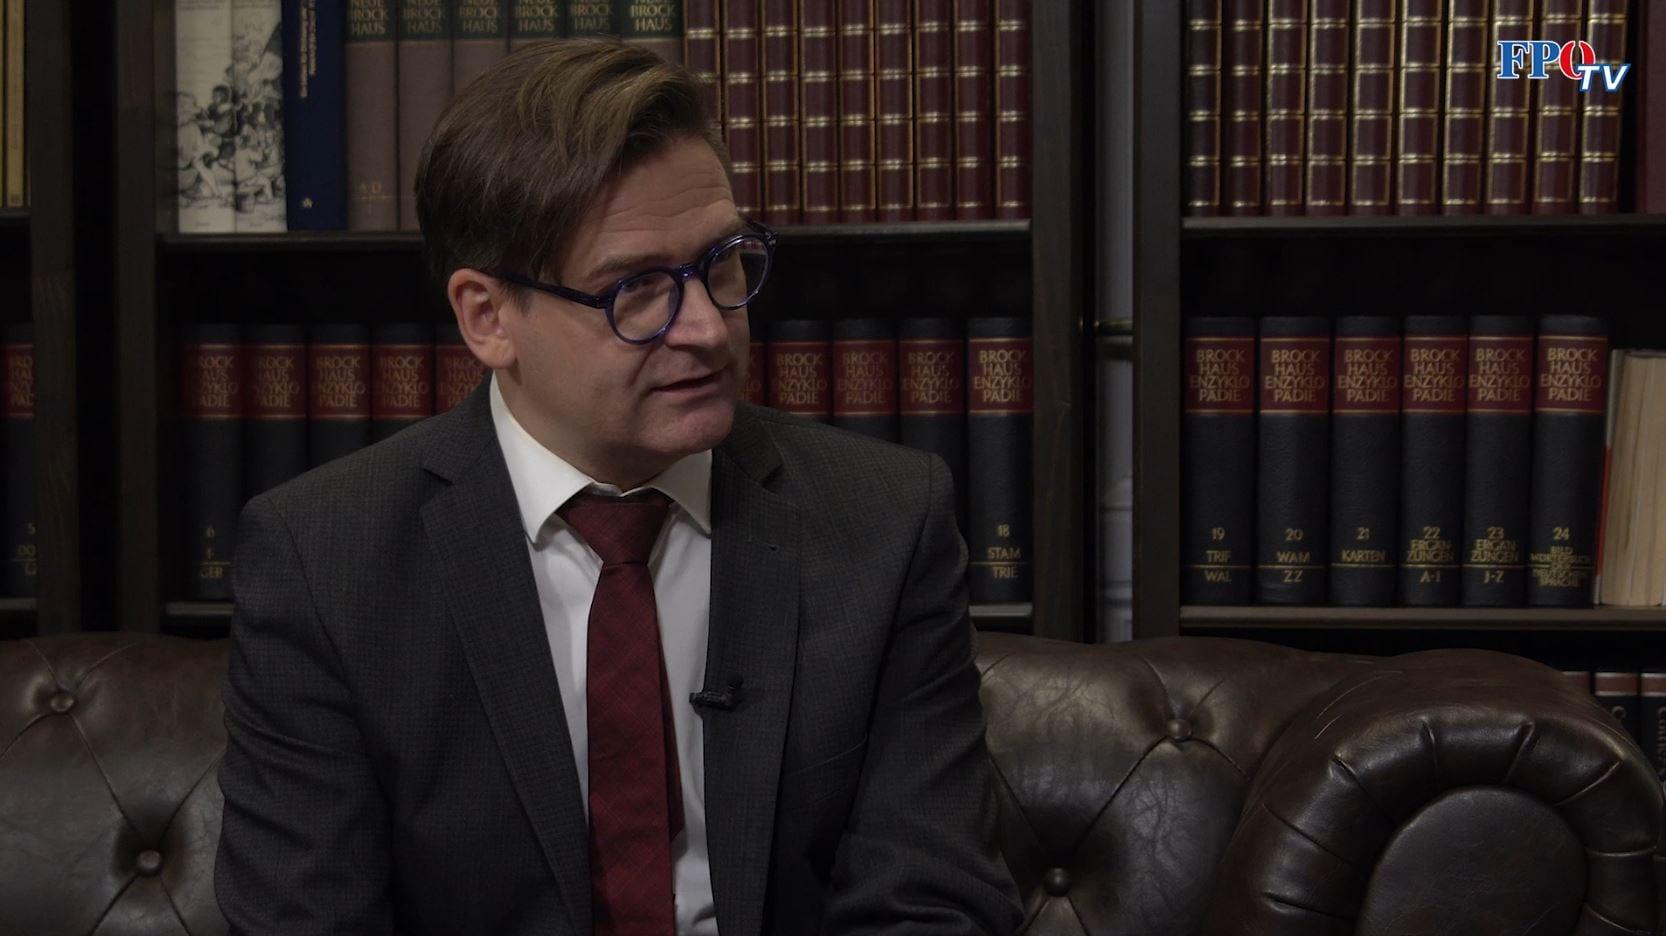 Dr. Alexander Scheer